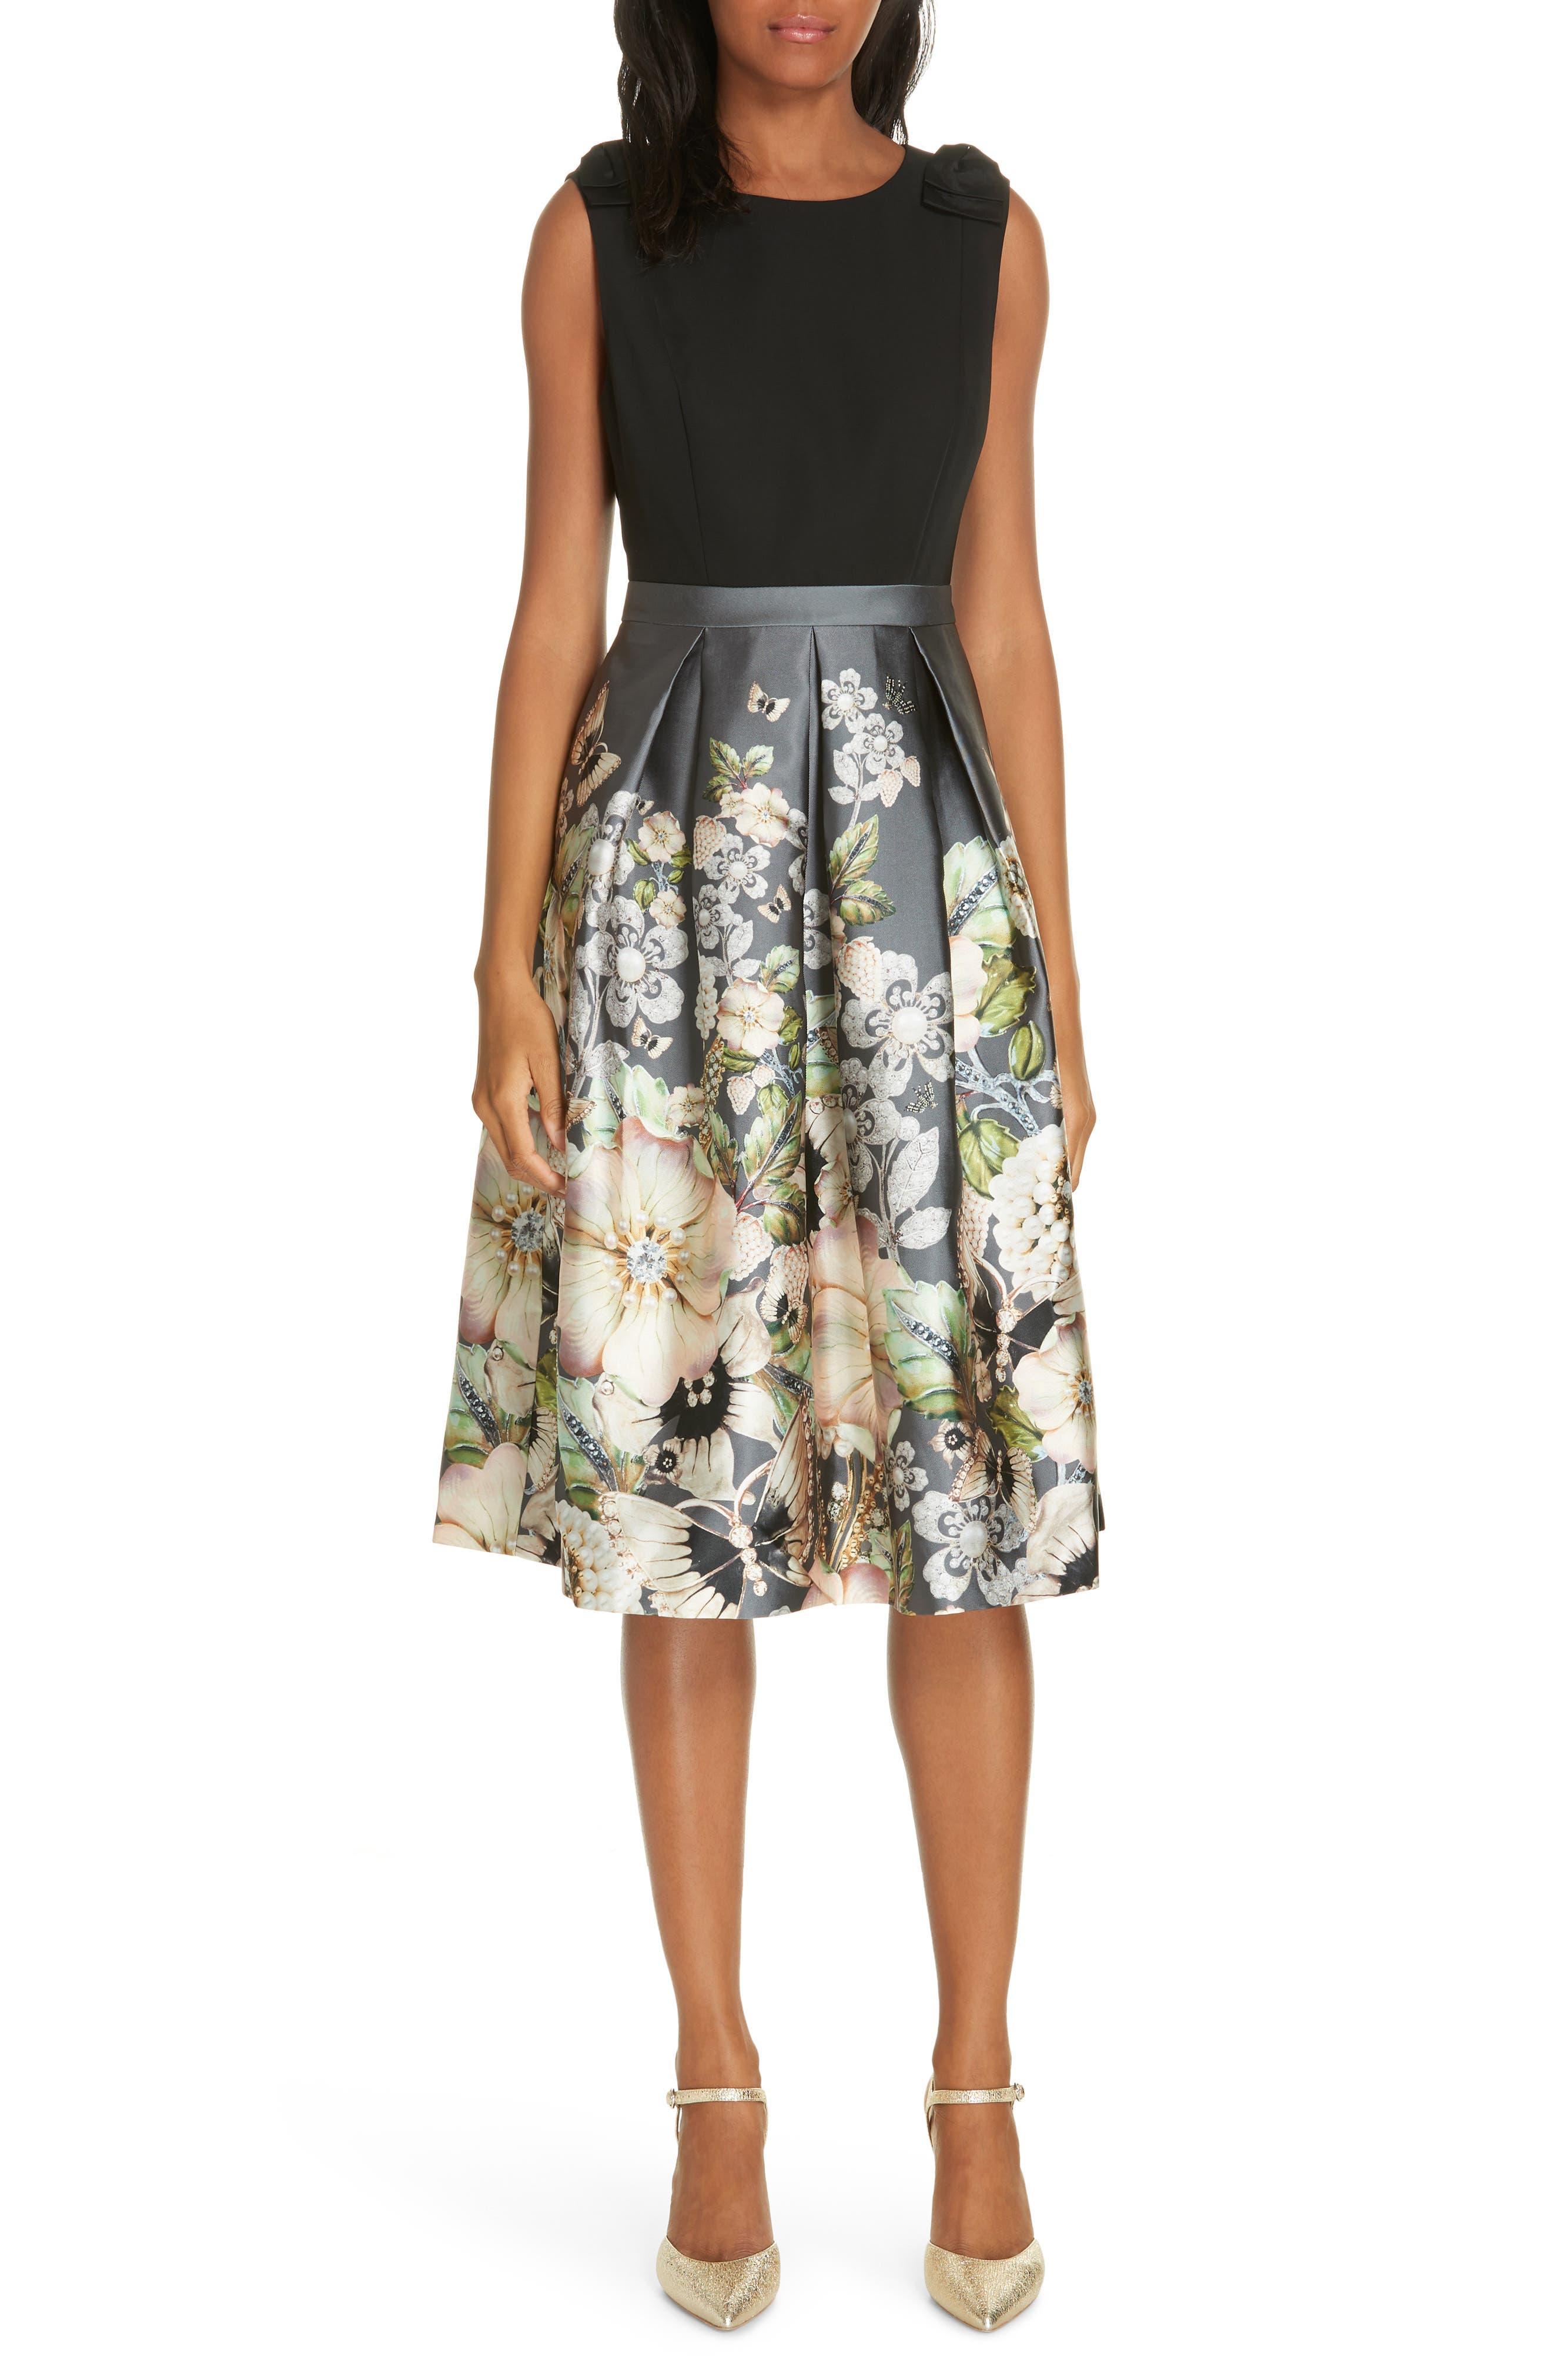 Molyka Gem Gardens Bow Dress,                             Main thumbnail 1, color,                             CHARCOAL